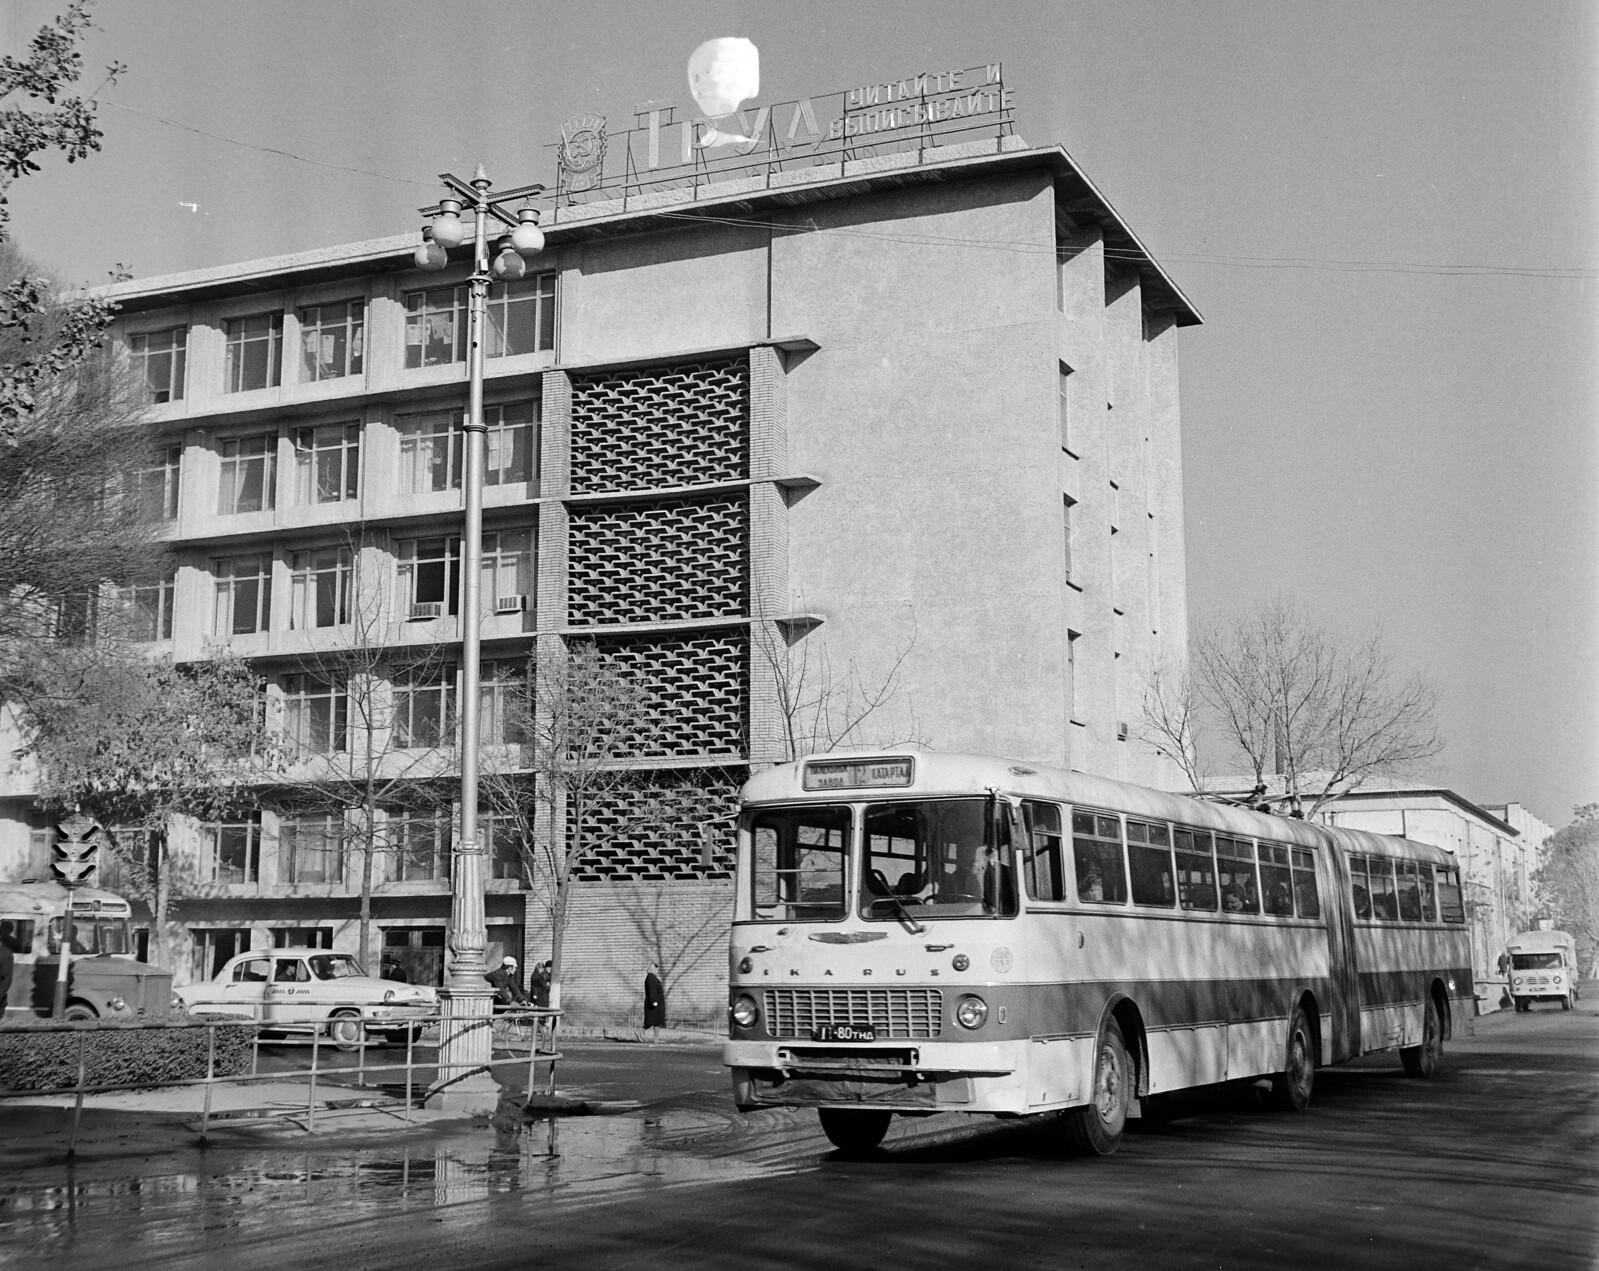 Самарканд. Улица Кирова перед перекрестком улицы Правды Востока, на заднем плане - штаб-квартира профсоюзов Узбекистана.